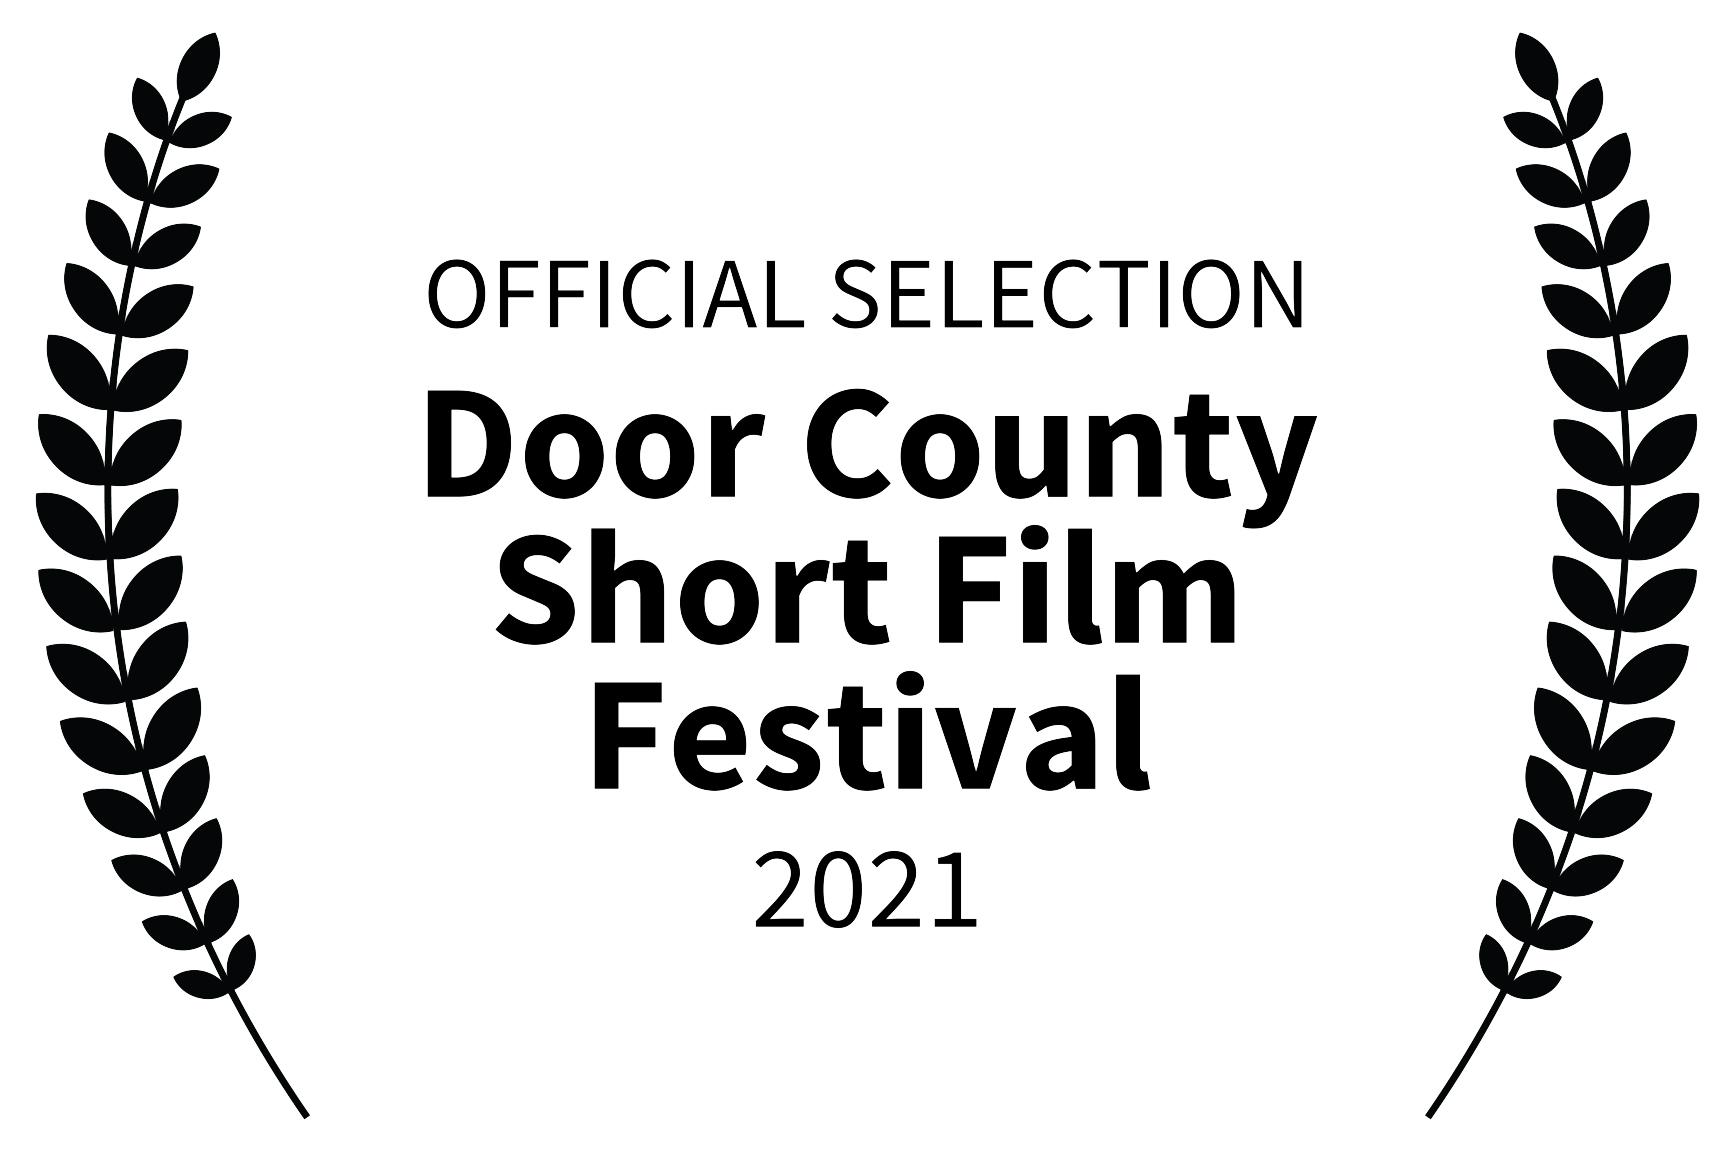 OFFICIAL-SELECTION---Door-County-Short-Film-Festival---2021